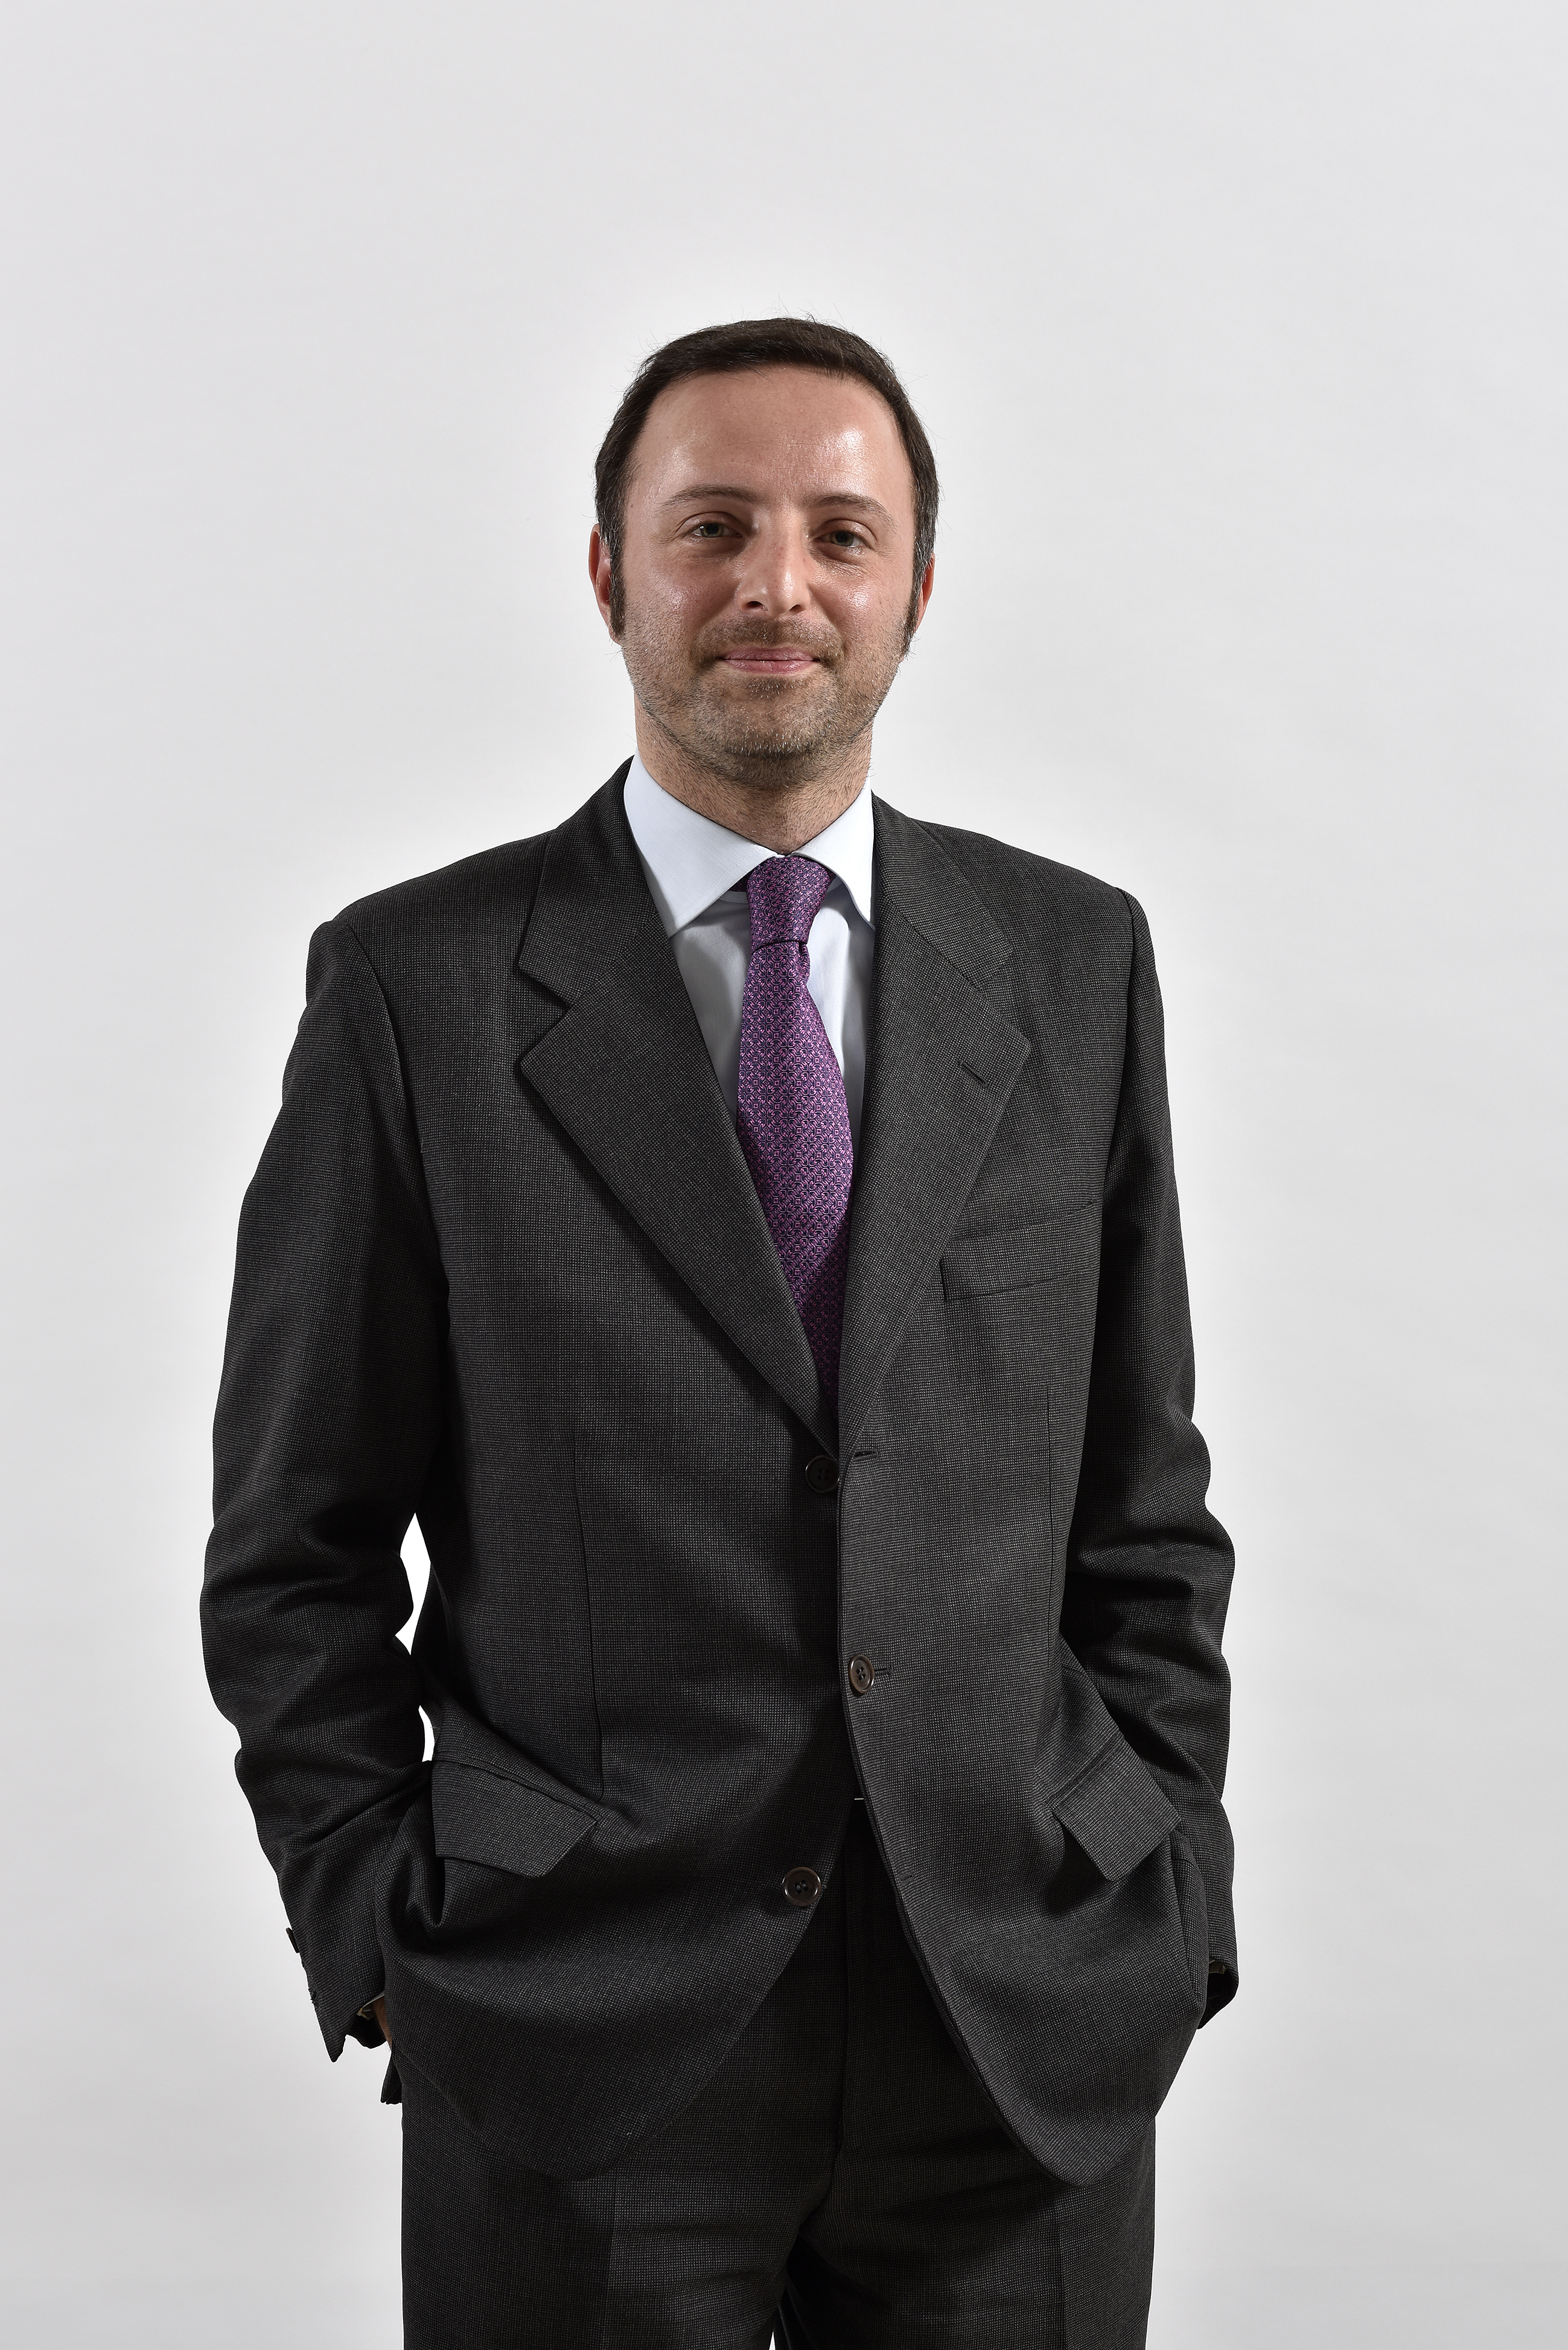 Luca Santaroni